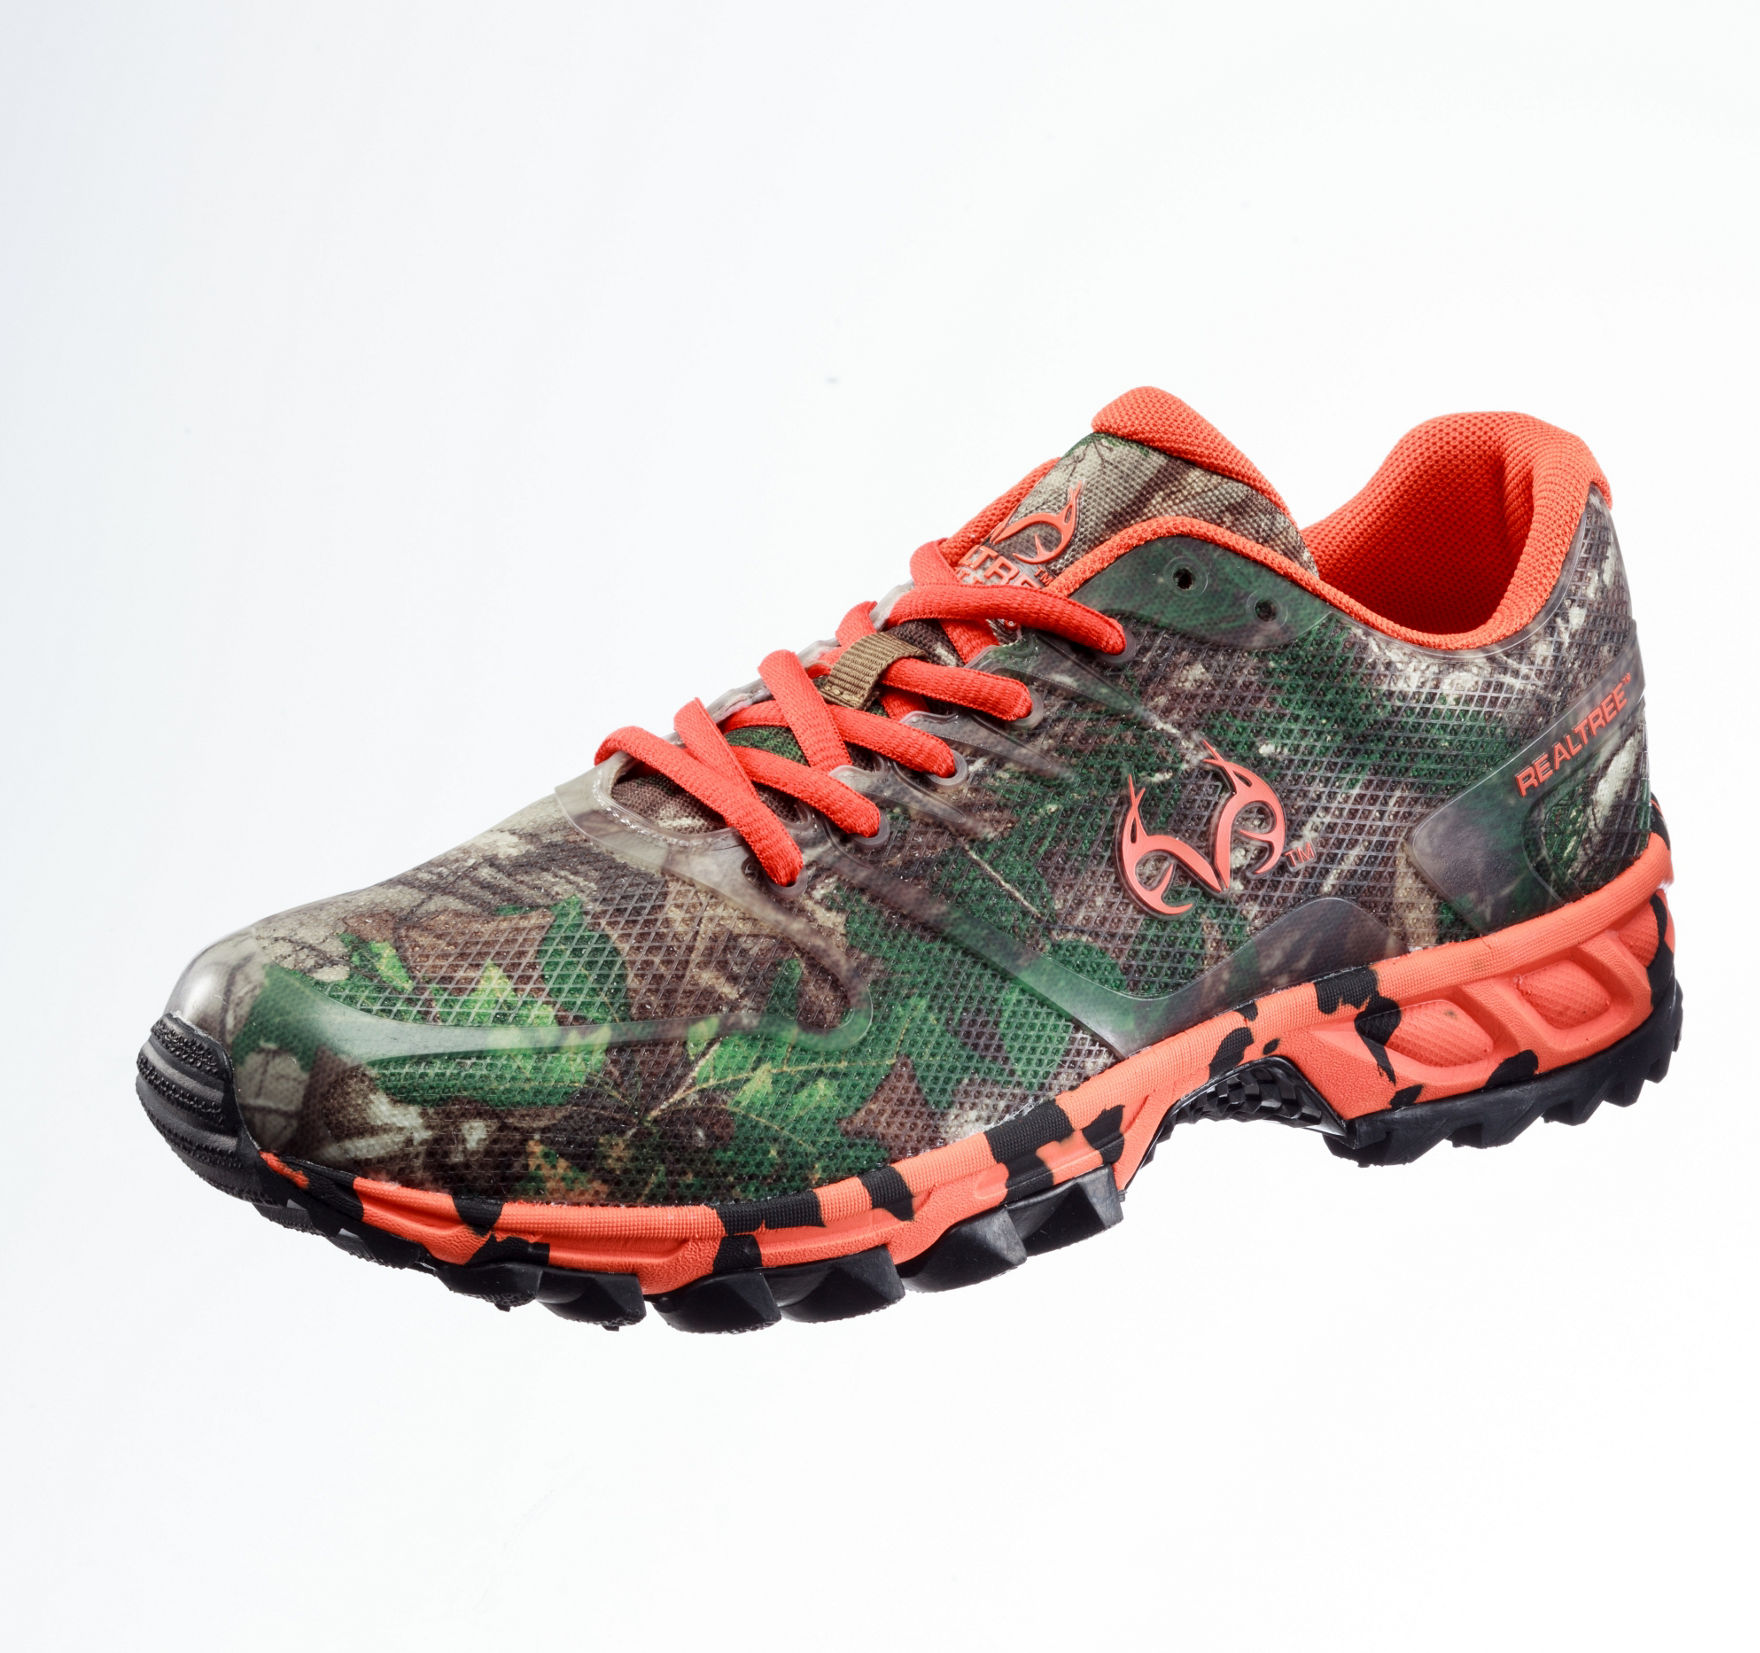 ... UPC 610152149344 product image for Realtree Cobra Athletic Shoes - Men s  - Orange - 10.5 - 043f0984ea9